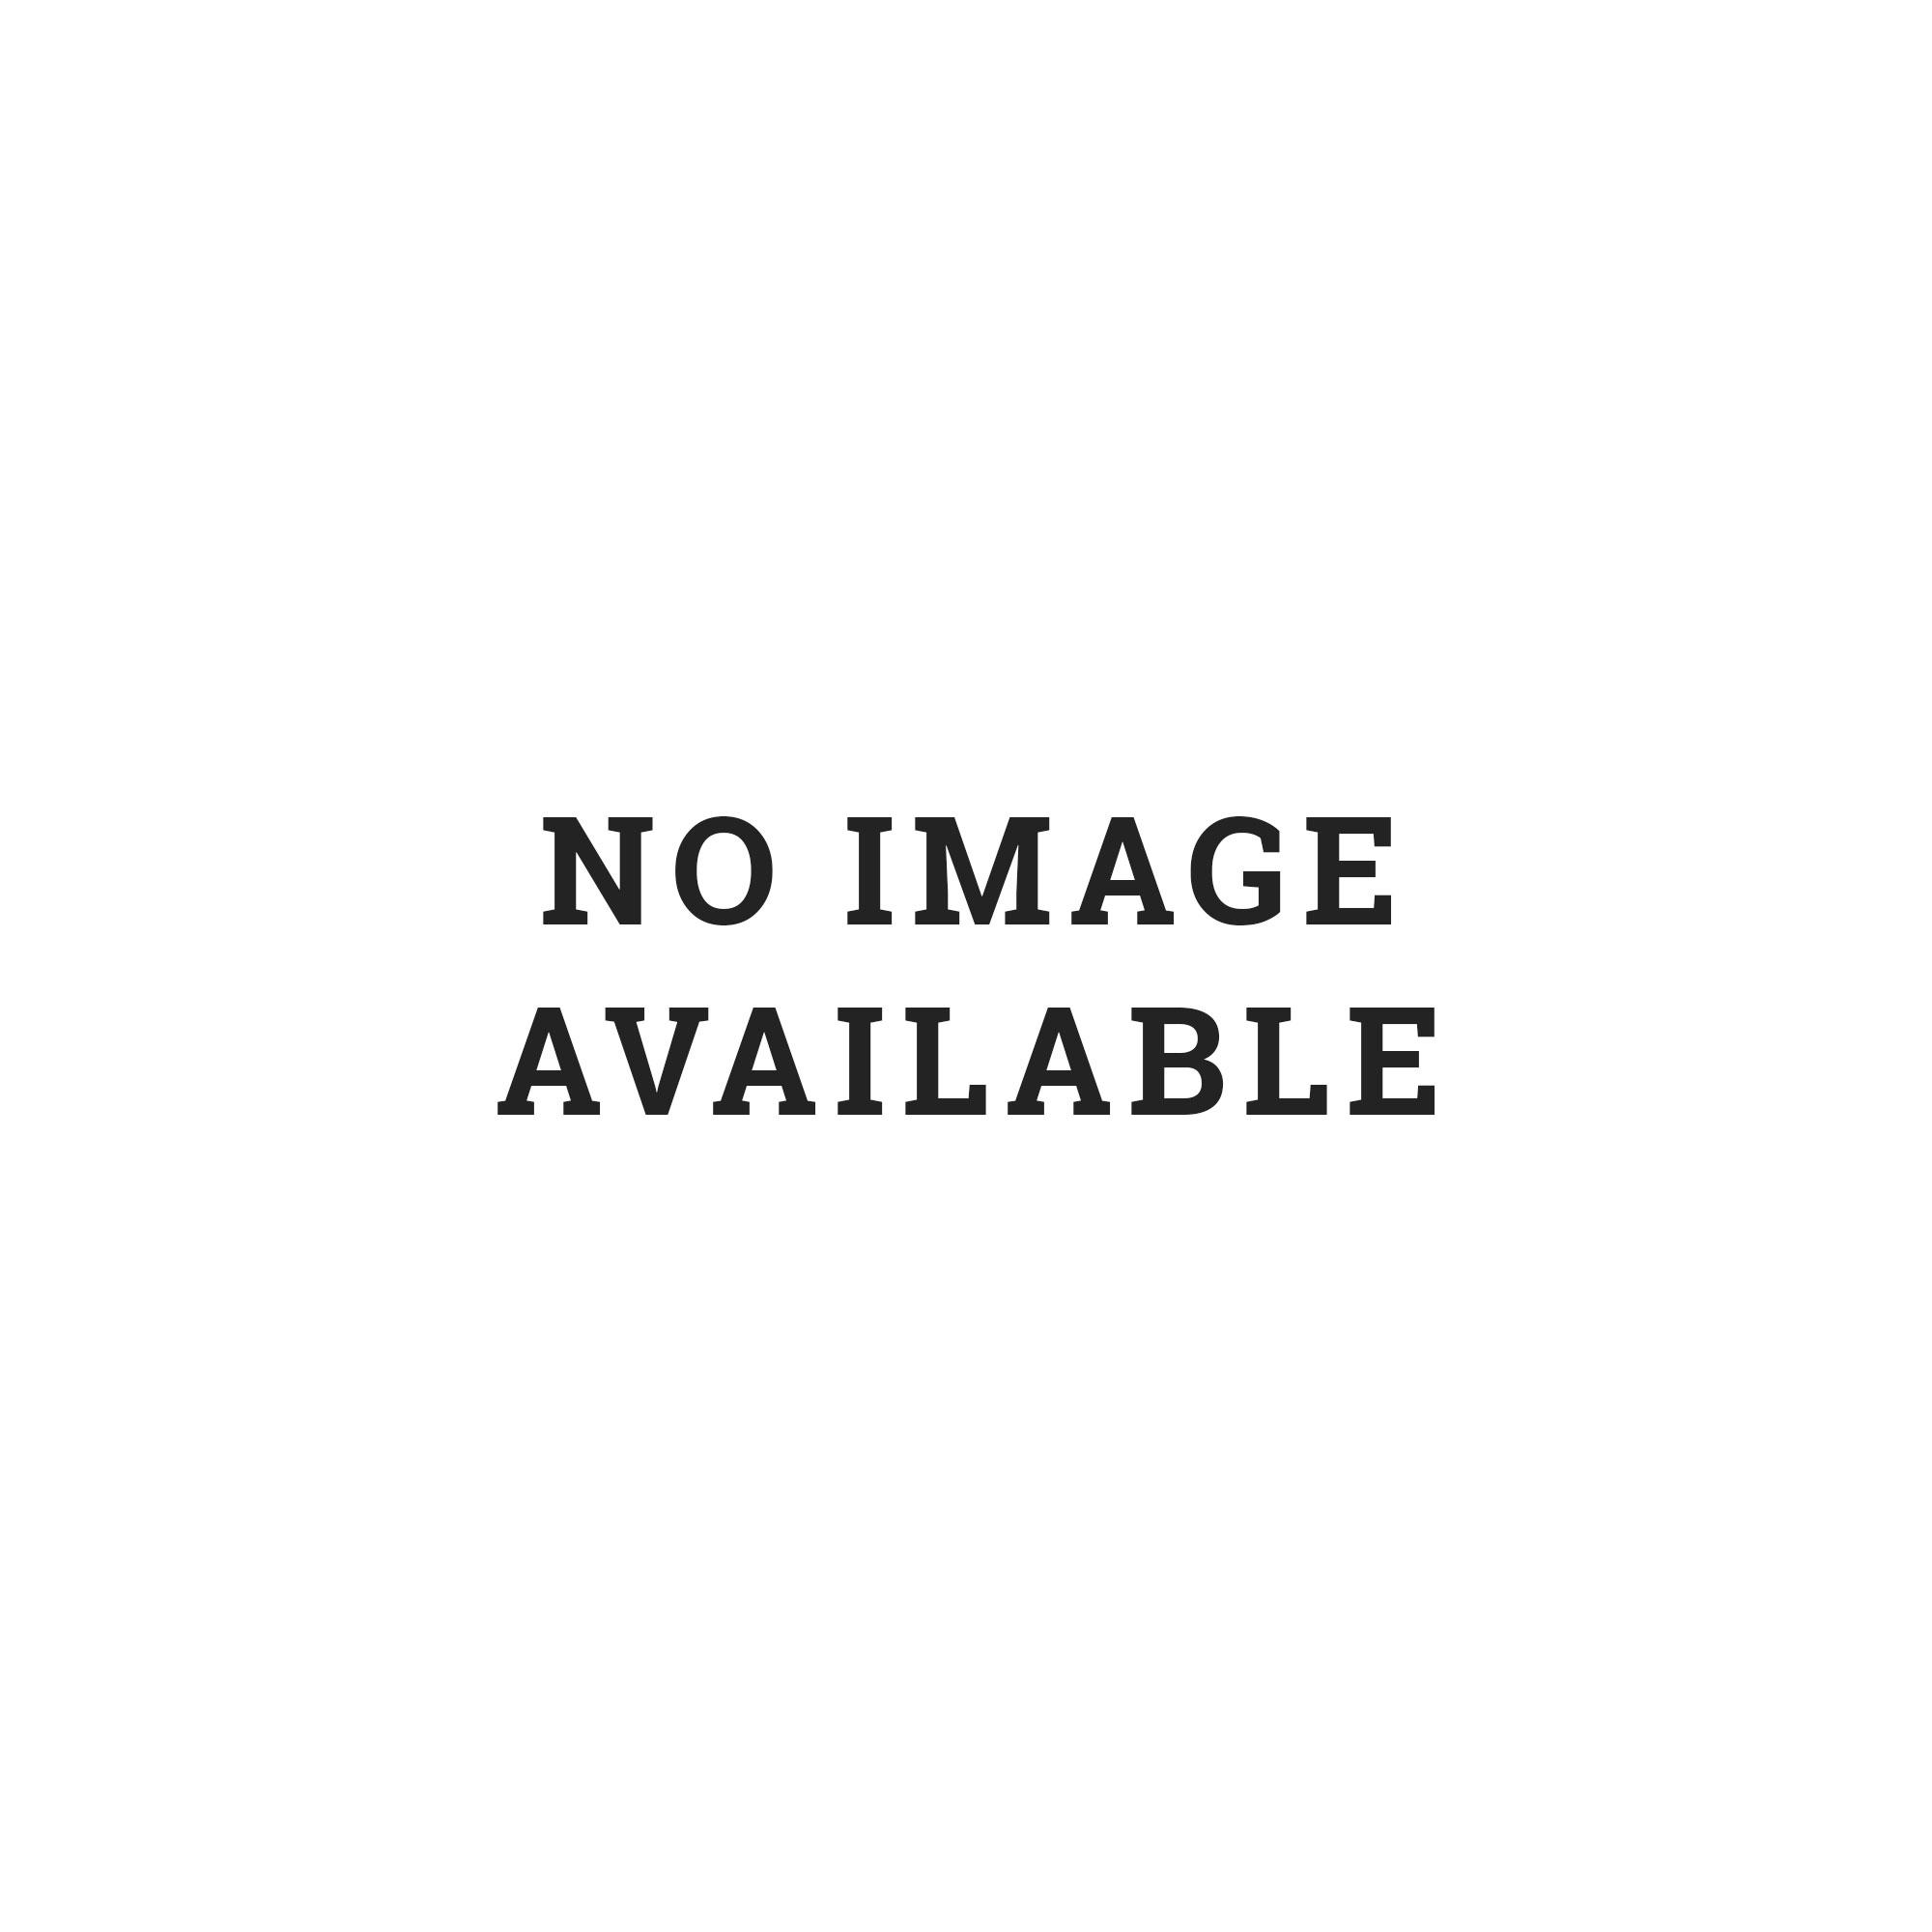 Dr Martens 1460 Unisex 8-Eyelet Pebble Grain Leather Boots - Black